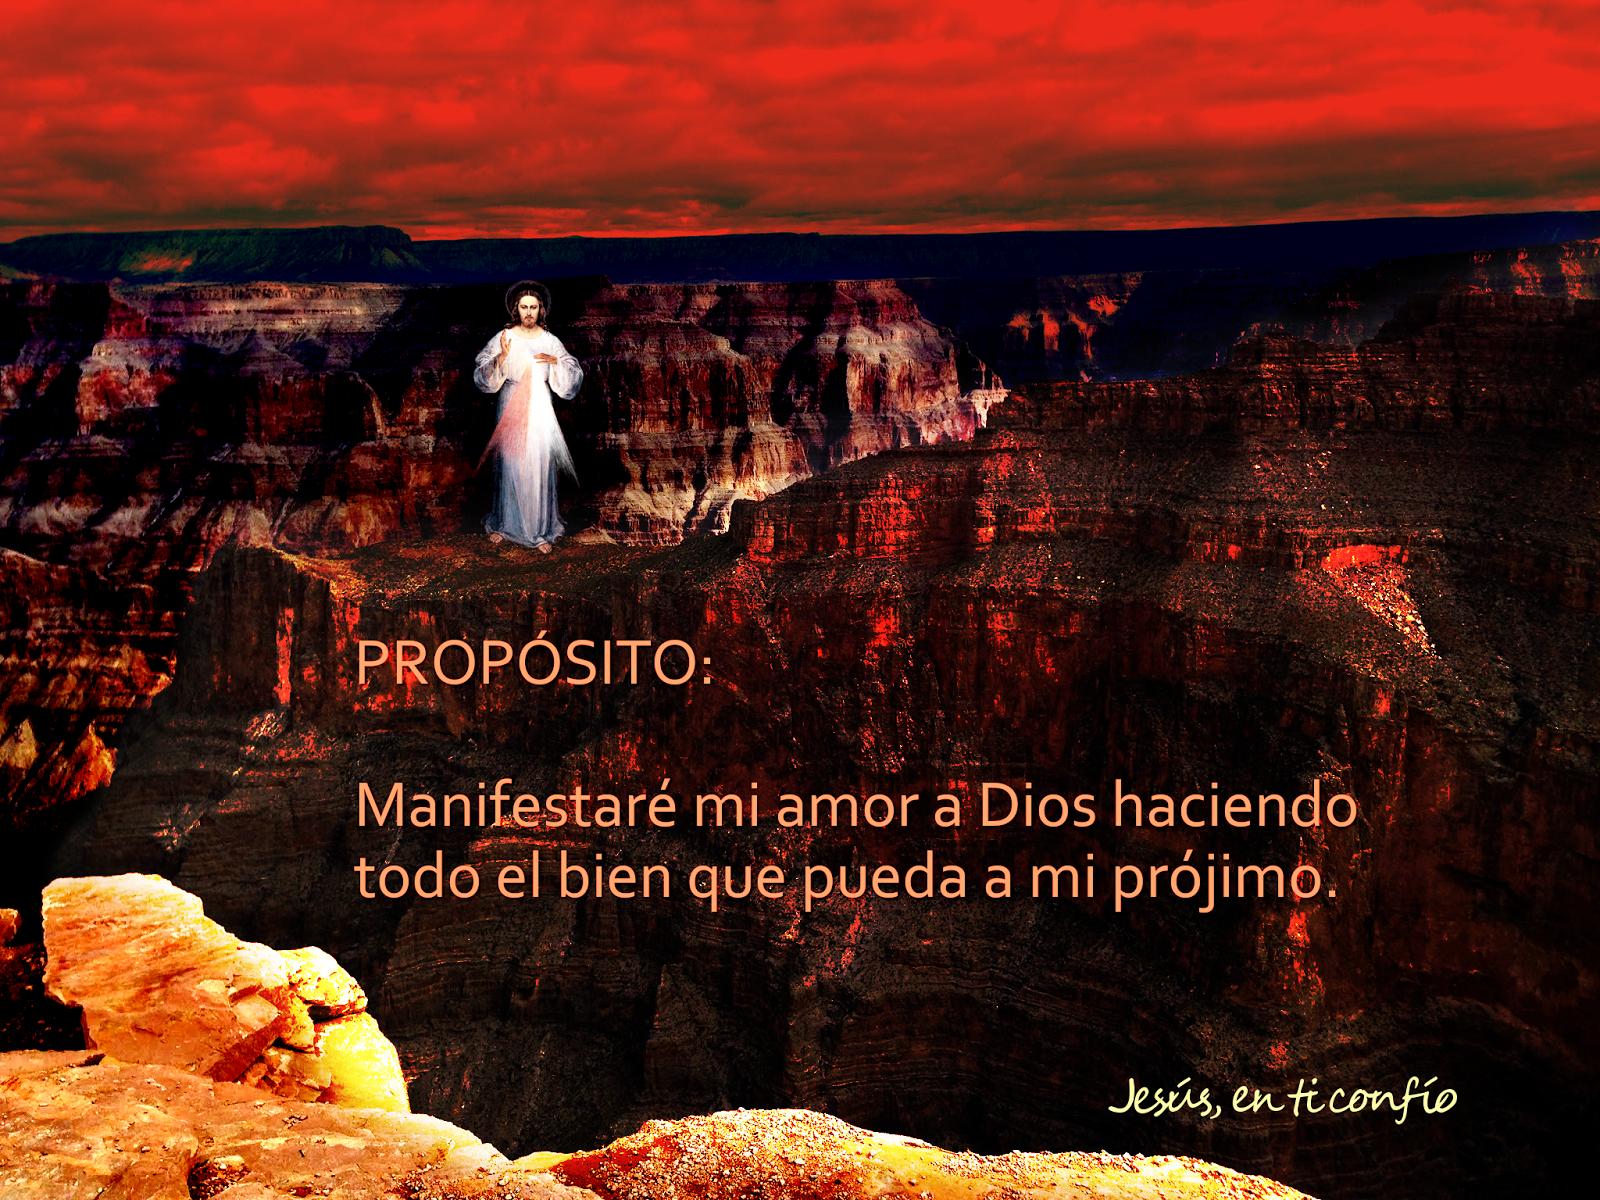 jesus misericordioso con un proposito para este siglo